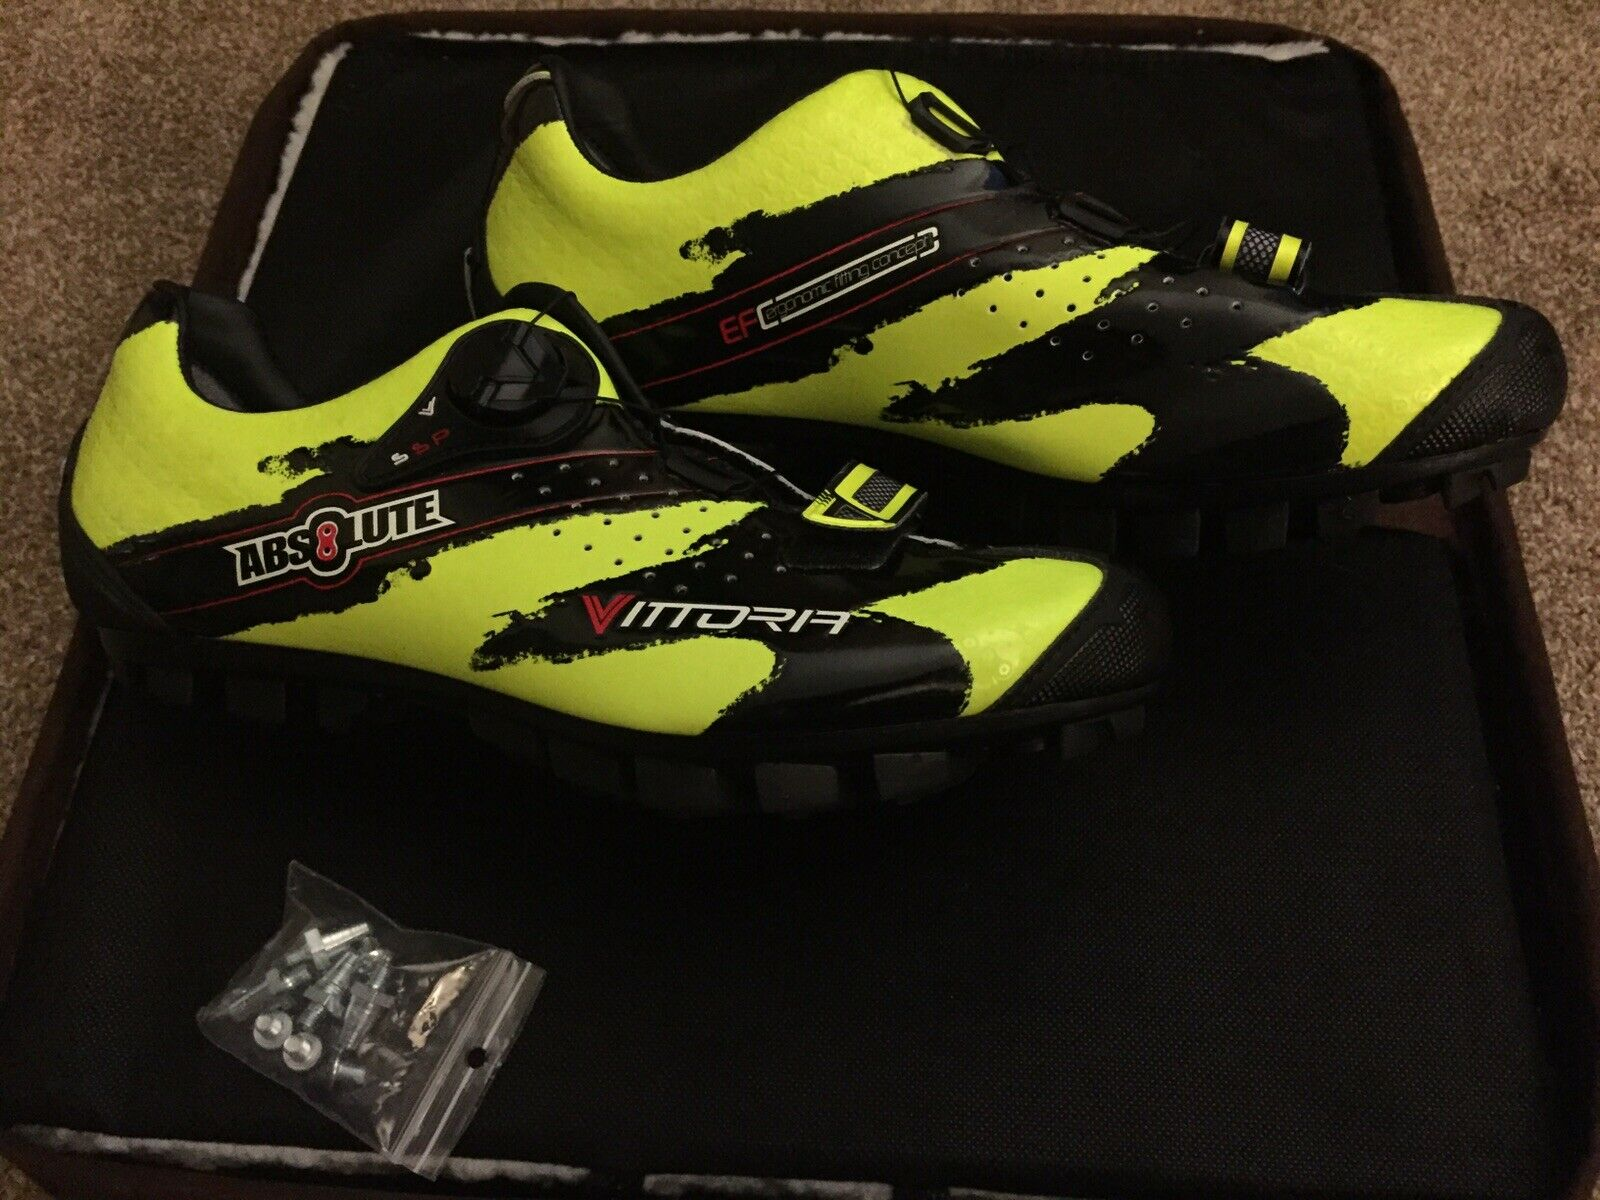 New In Box Vittoria Absolute MTB Shoes Yellow Size 7 Men's, 8.5 Women's 39 EU